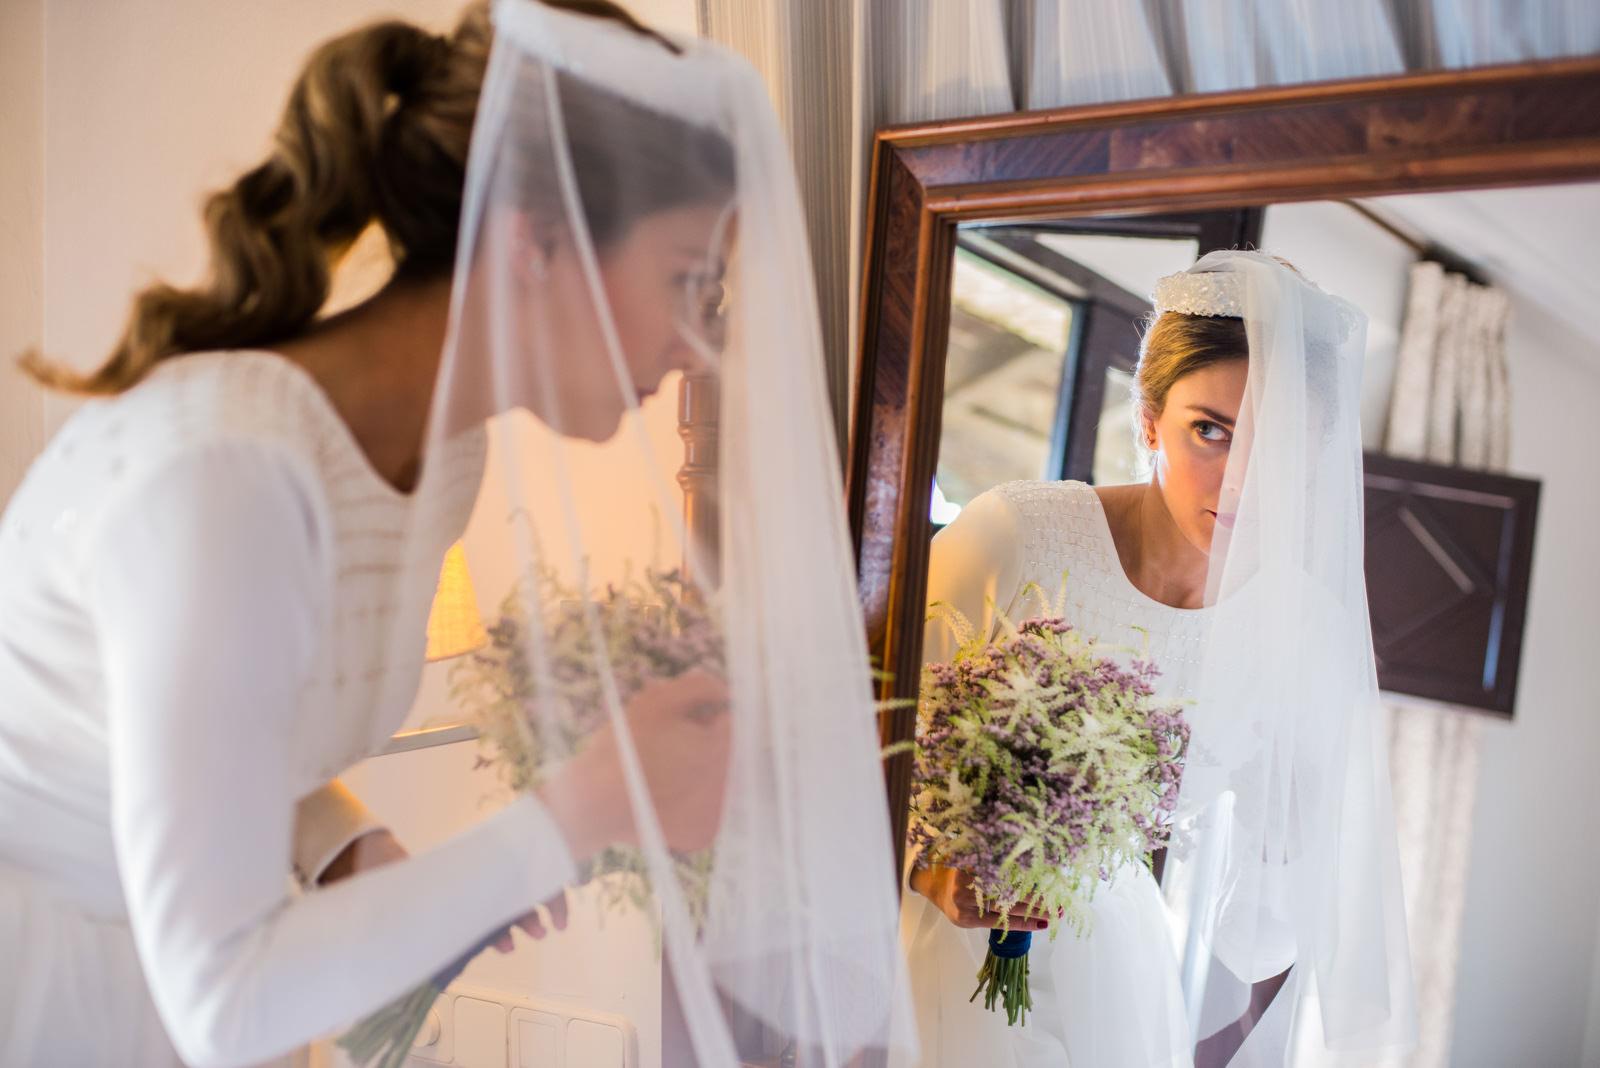 Boda-Sevilla-Parador-Carmona-bridal-engagement-Rafael-Torres-fotografo-bodas-sevilla-madrid-barcelona-wedding-photographer--27.jpg